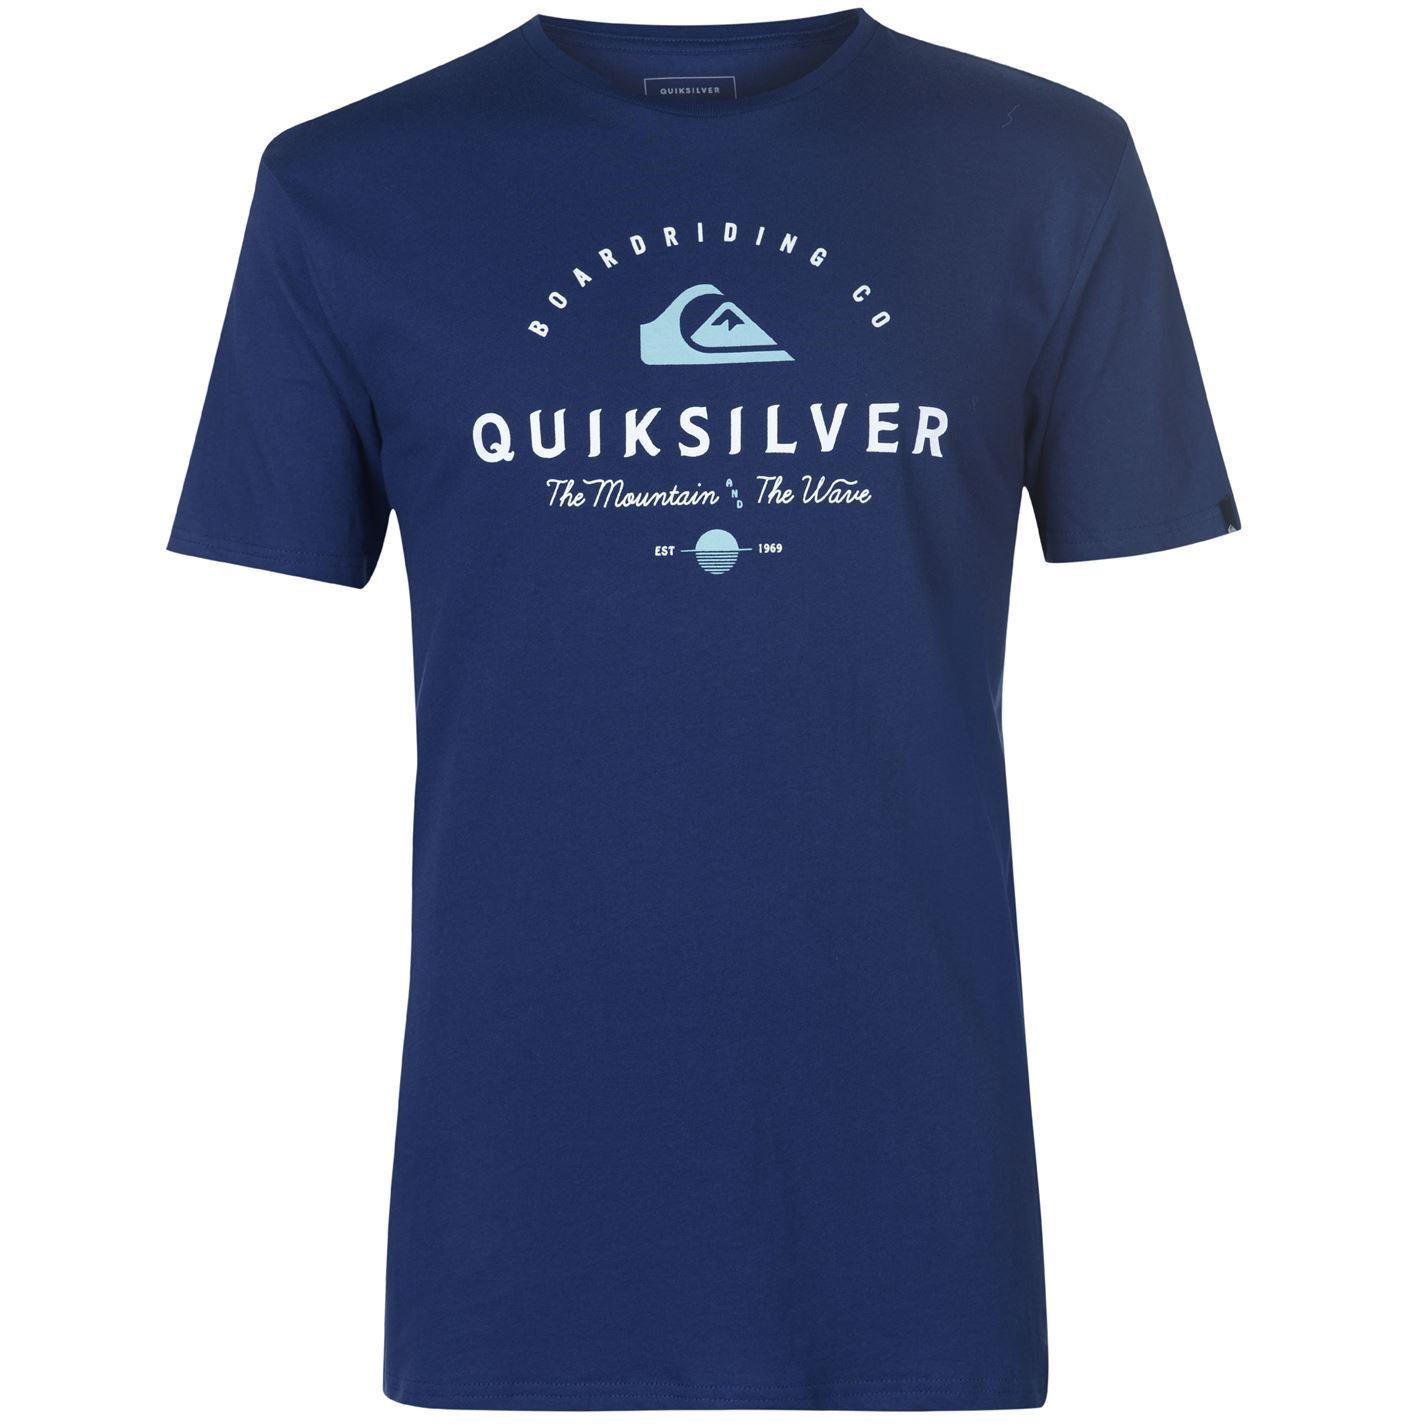 Quiksilver-Working-Man-T-Shirt-Mens-Tee-Shirt-Top thumbnail 5